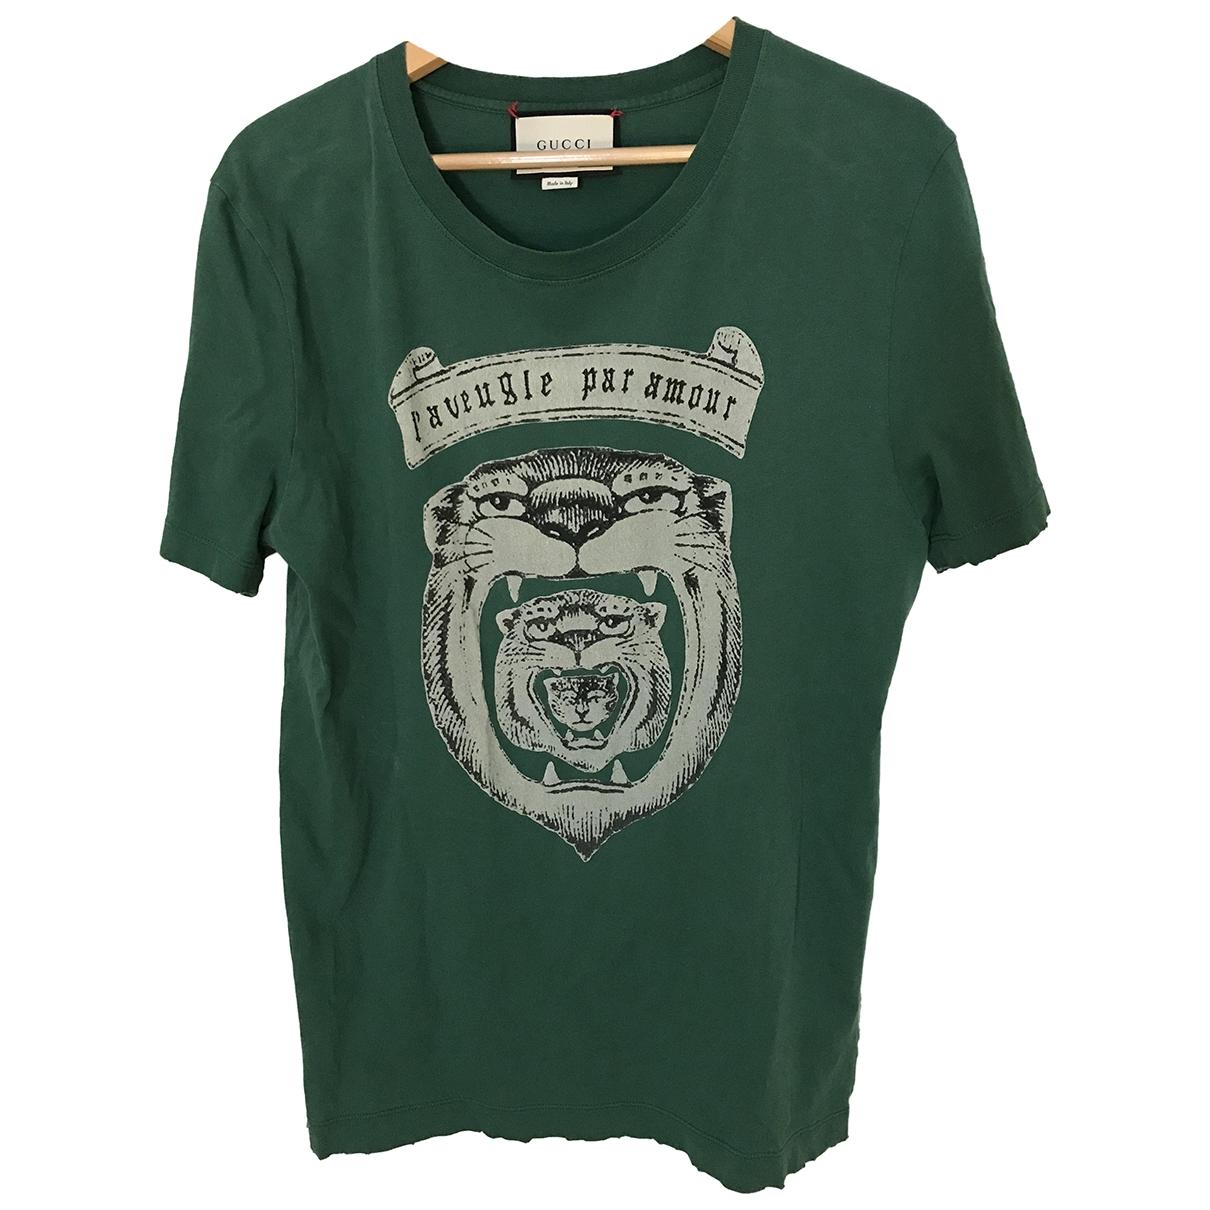 Gucci \N Green Cotton T-shirts for Men S International